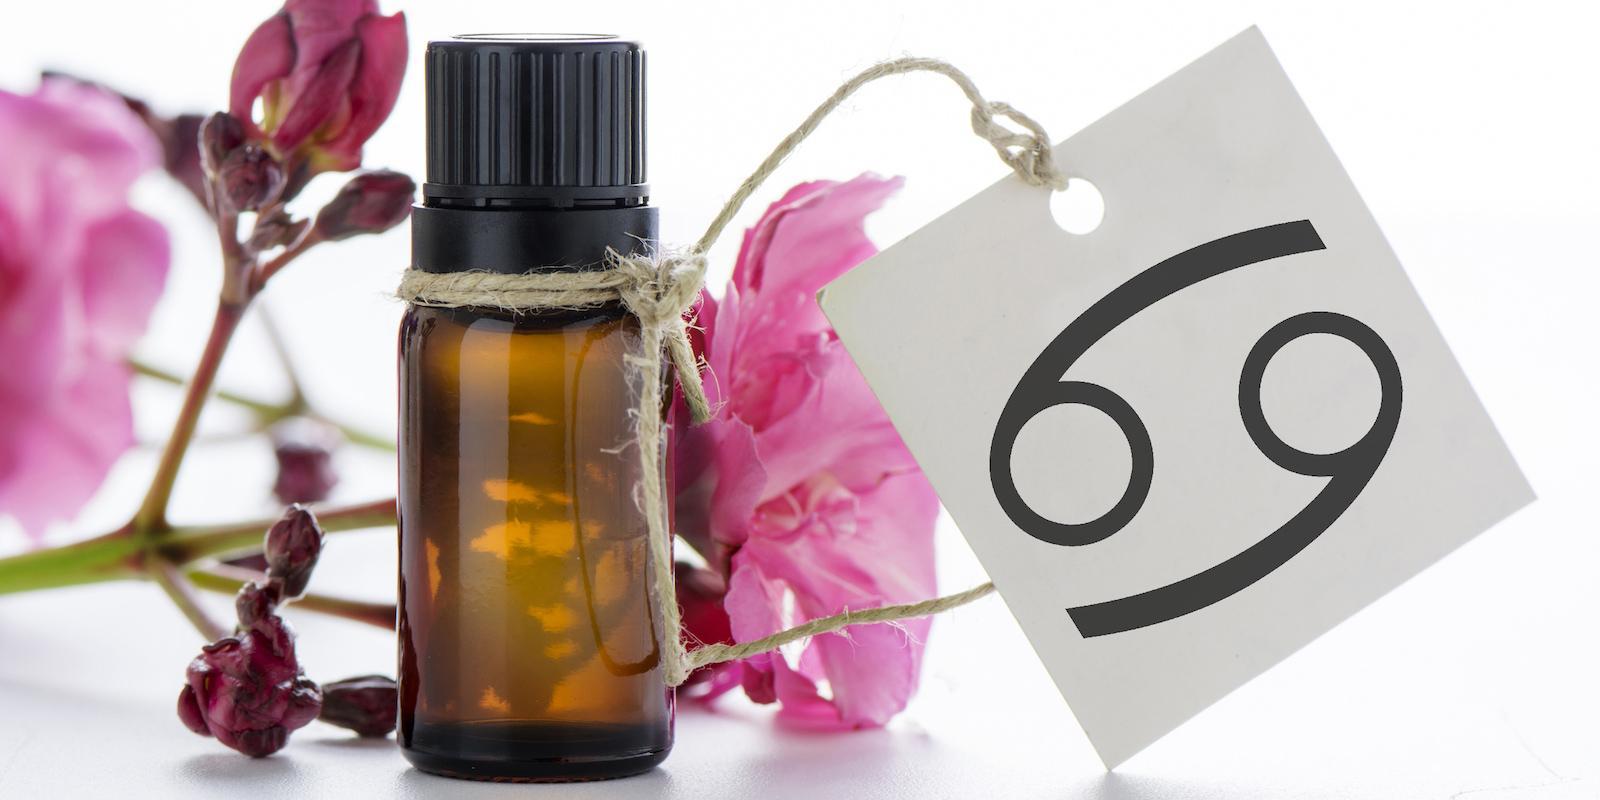 Aromaterapeutický horoskop - Rak